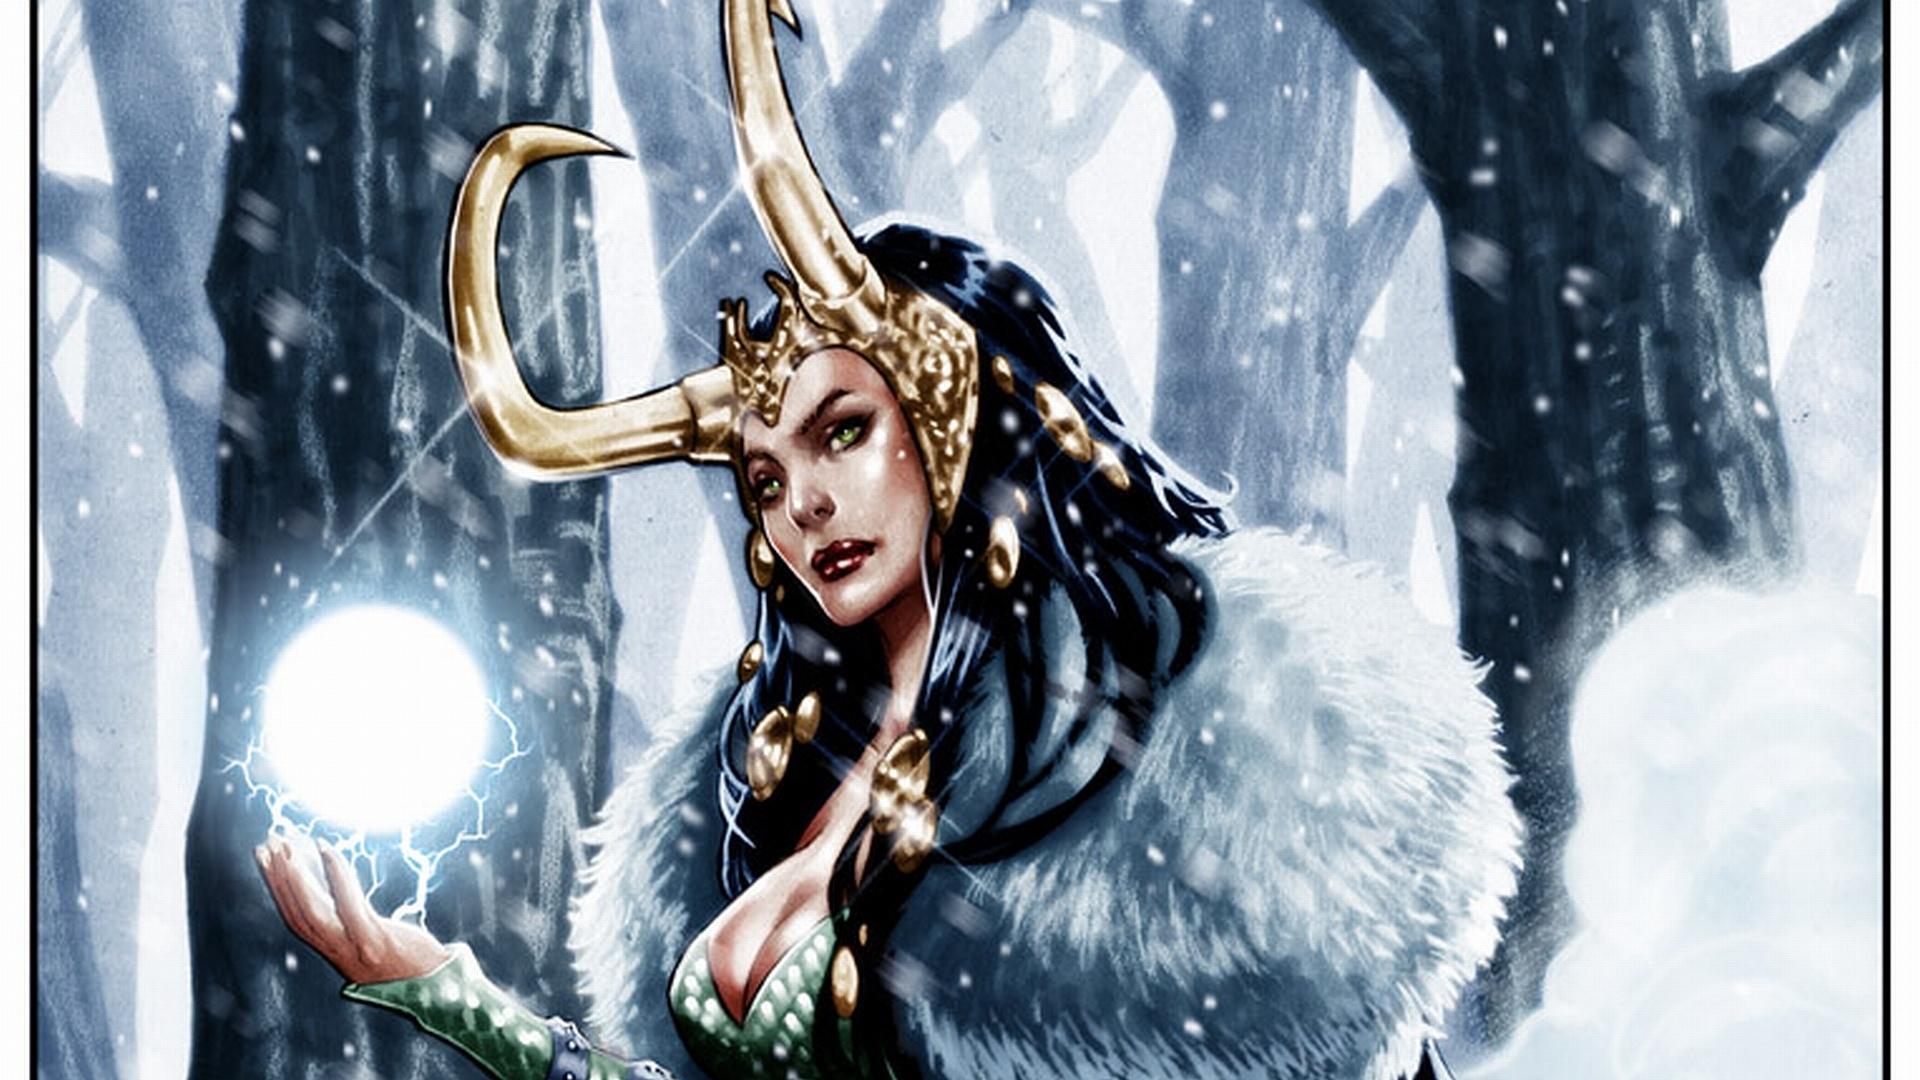 Loki Comics wallpapers HD quality